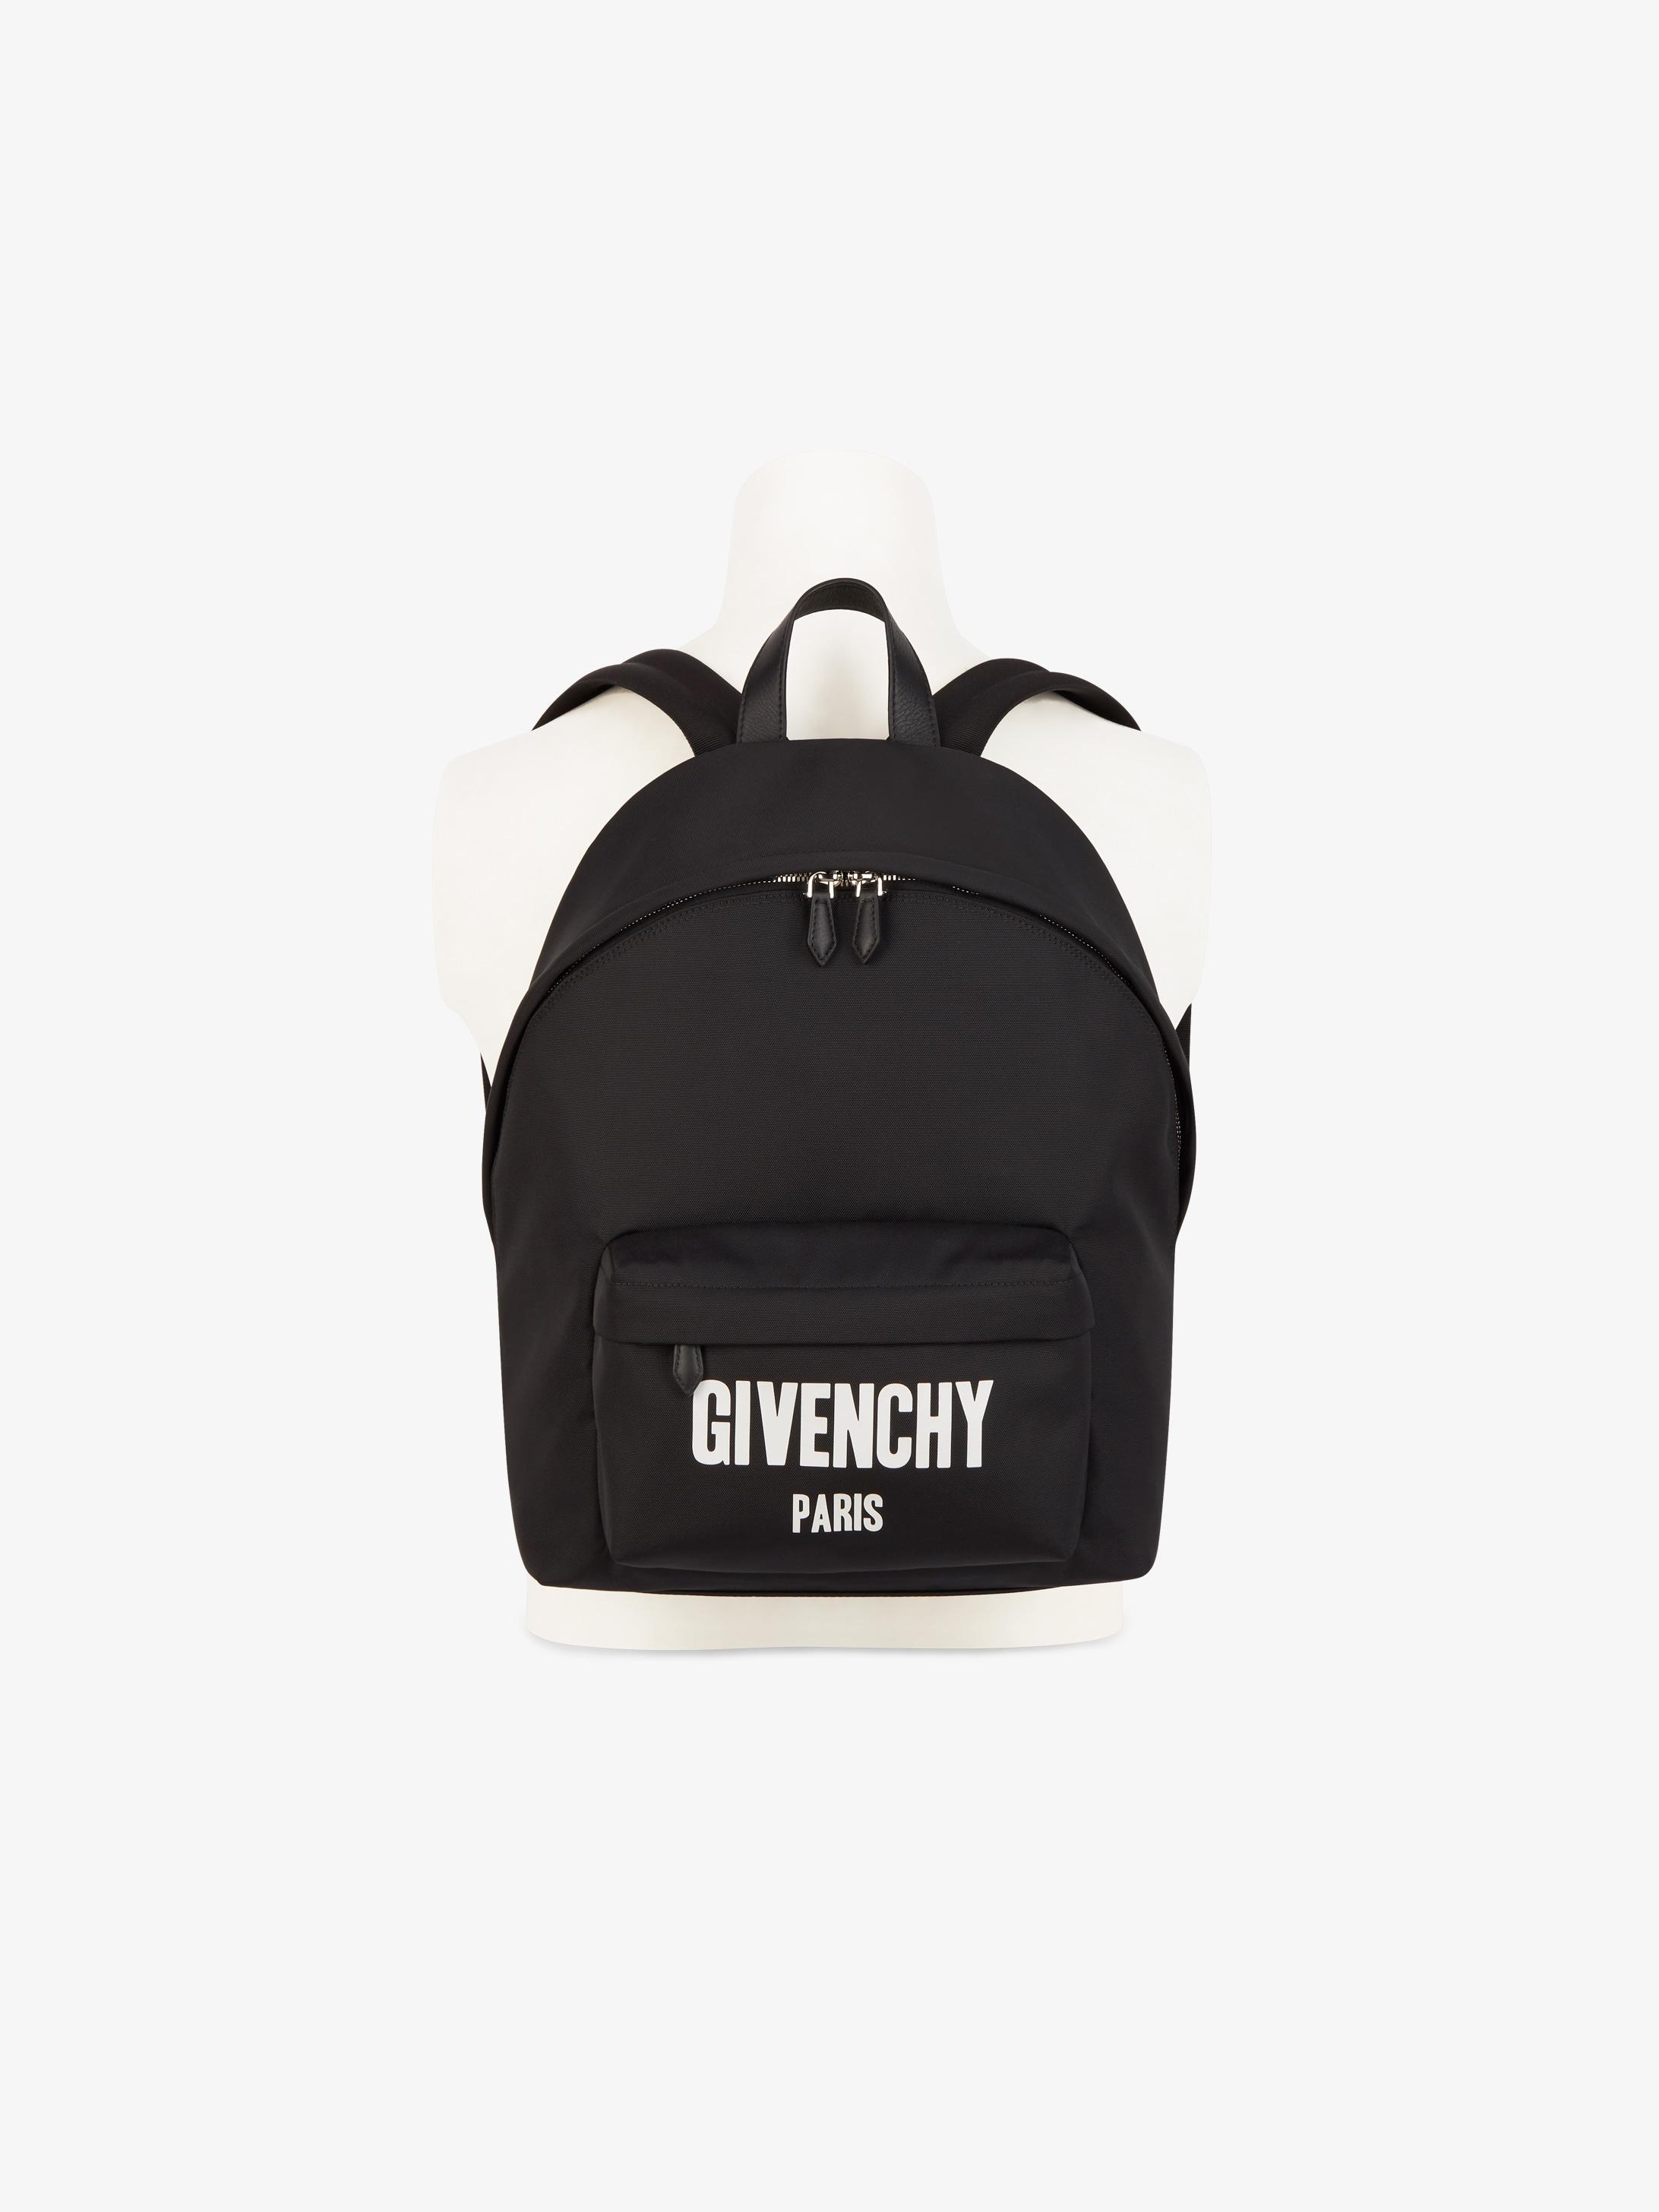 GIVENCHY PARIS printed backpack